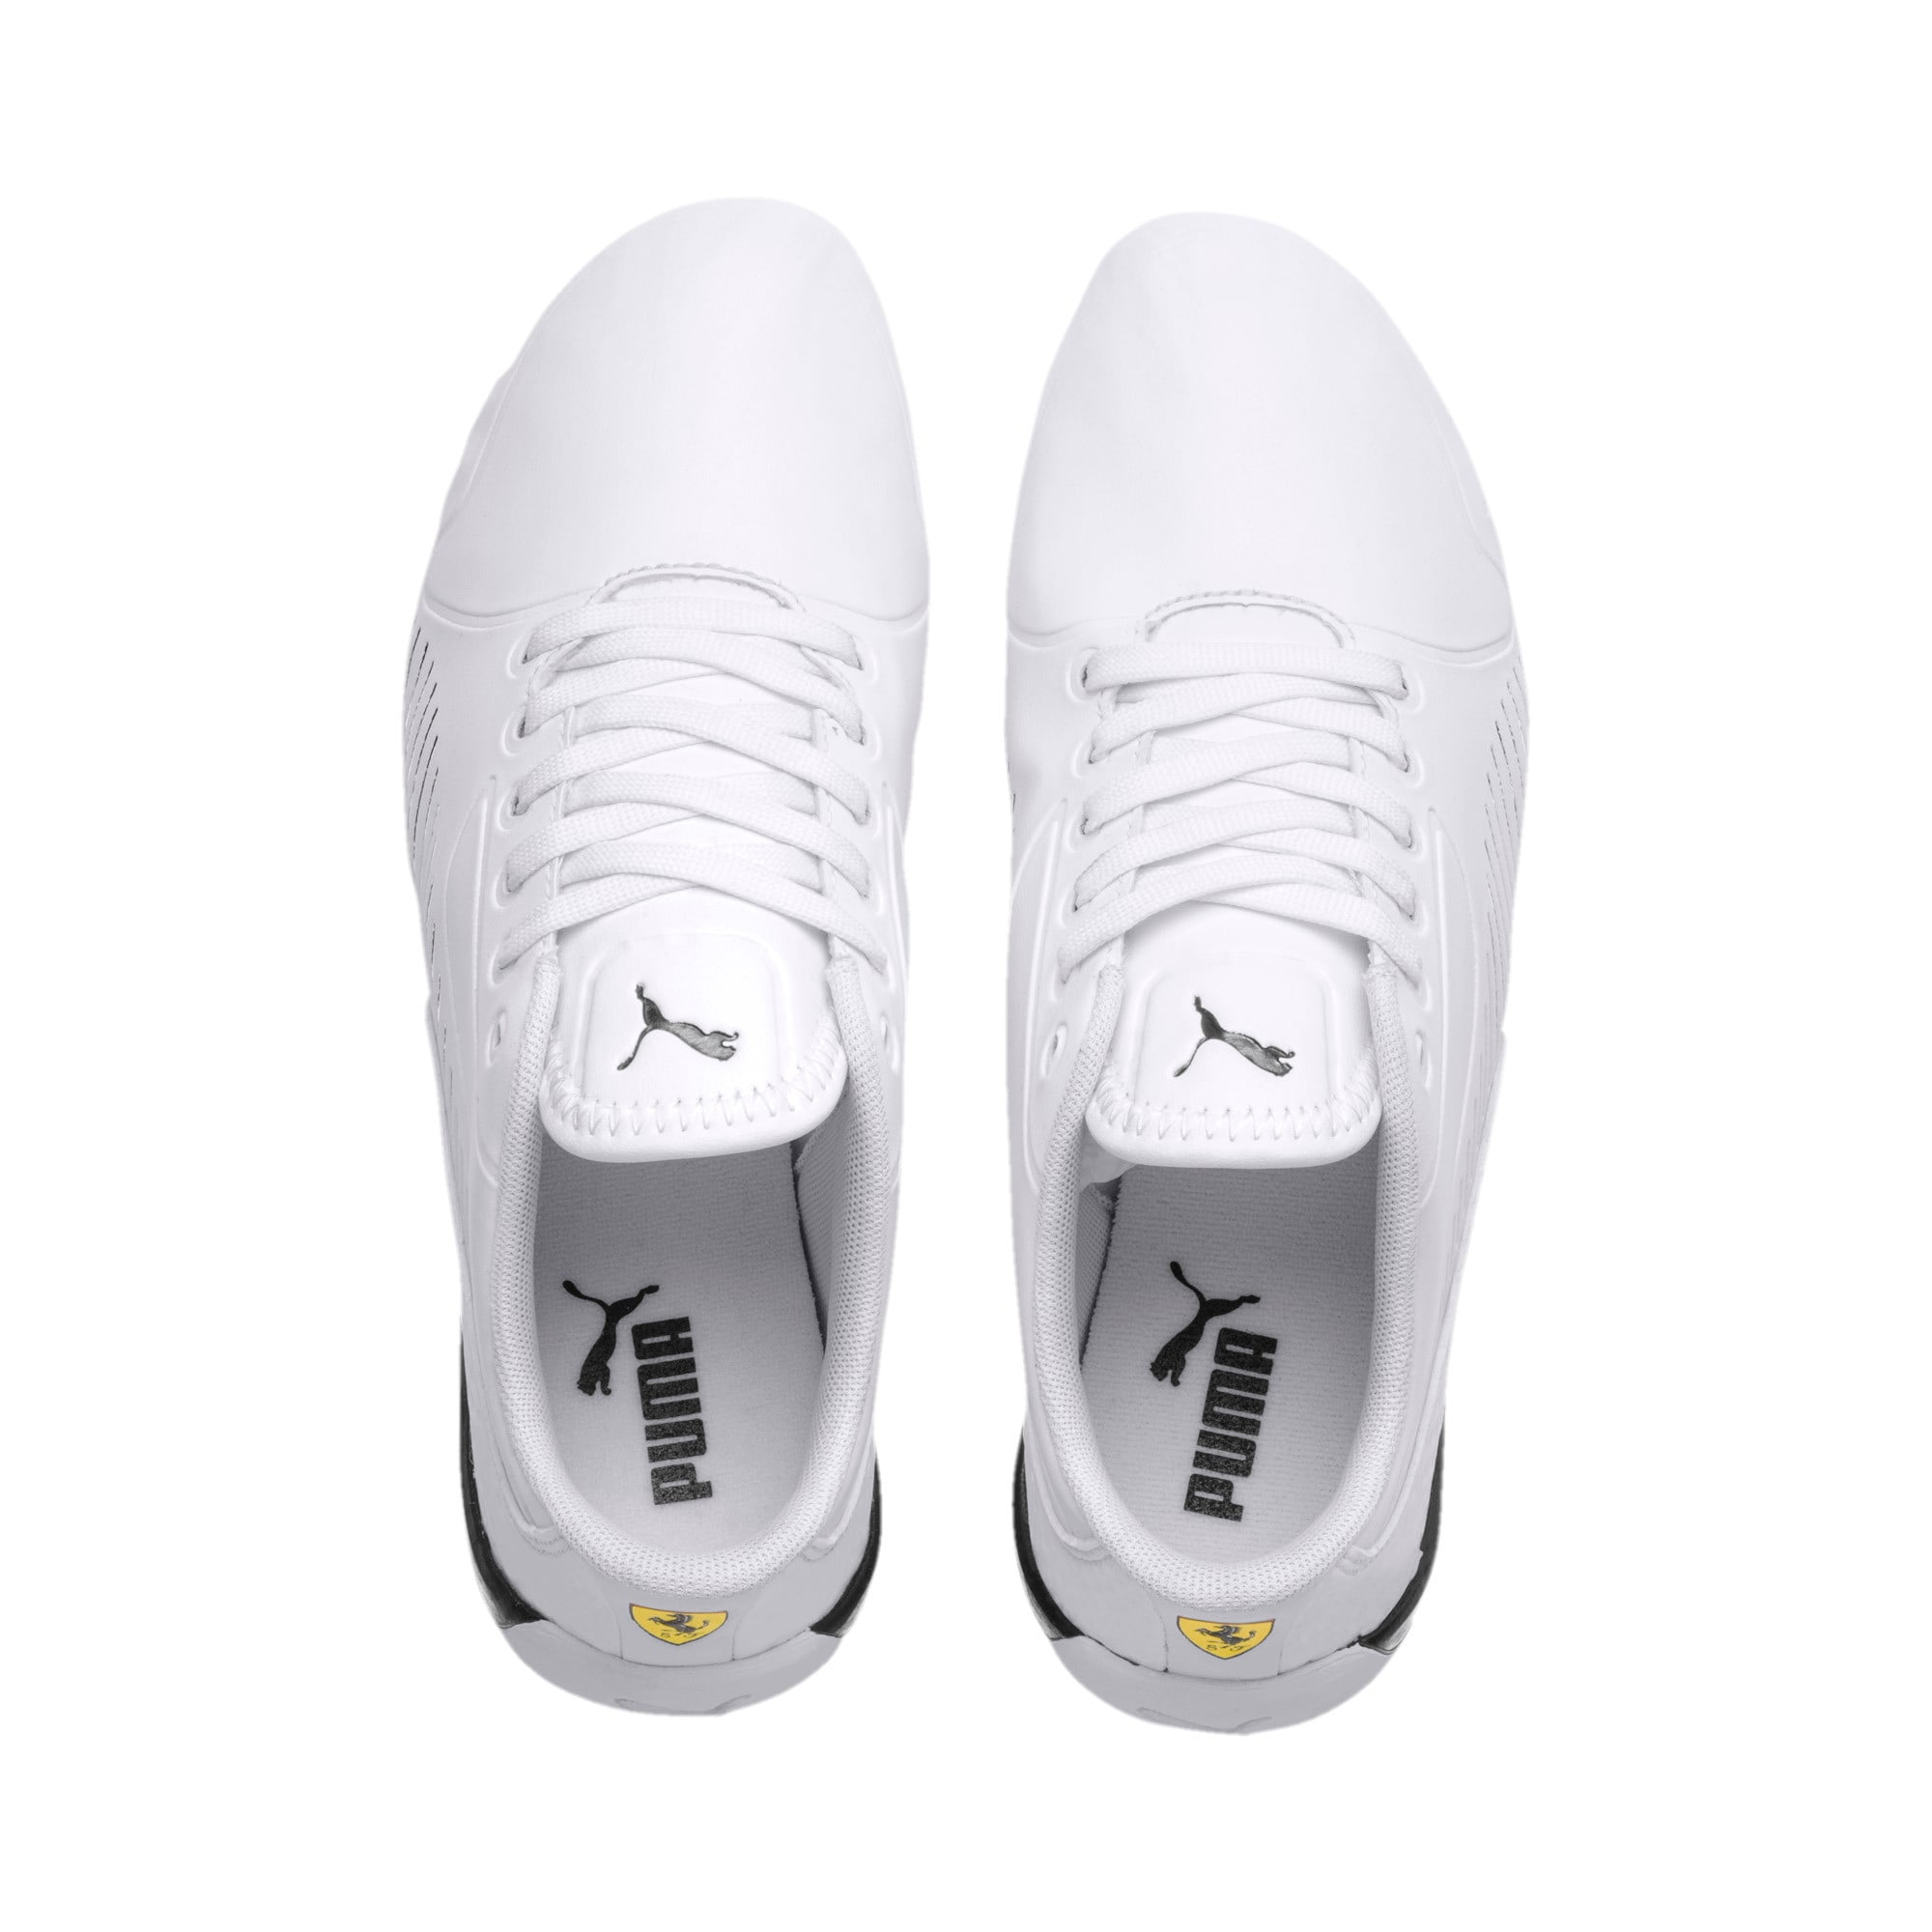 Thumbnail 6 of Ferrari Drift Cat 7S Ultra Youth Sneaker, Puma White-Puma Black, medium